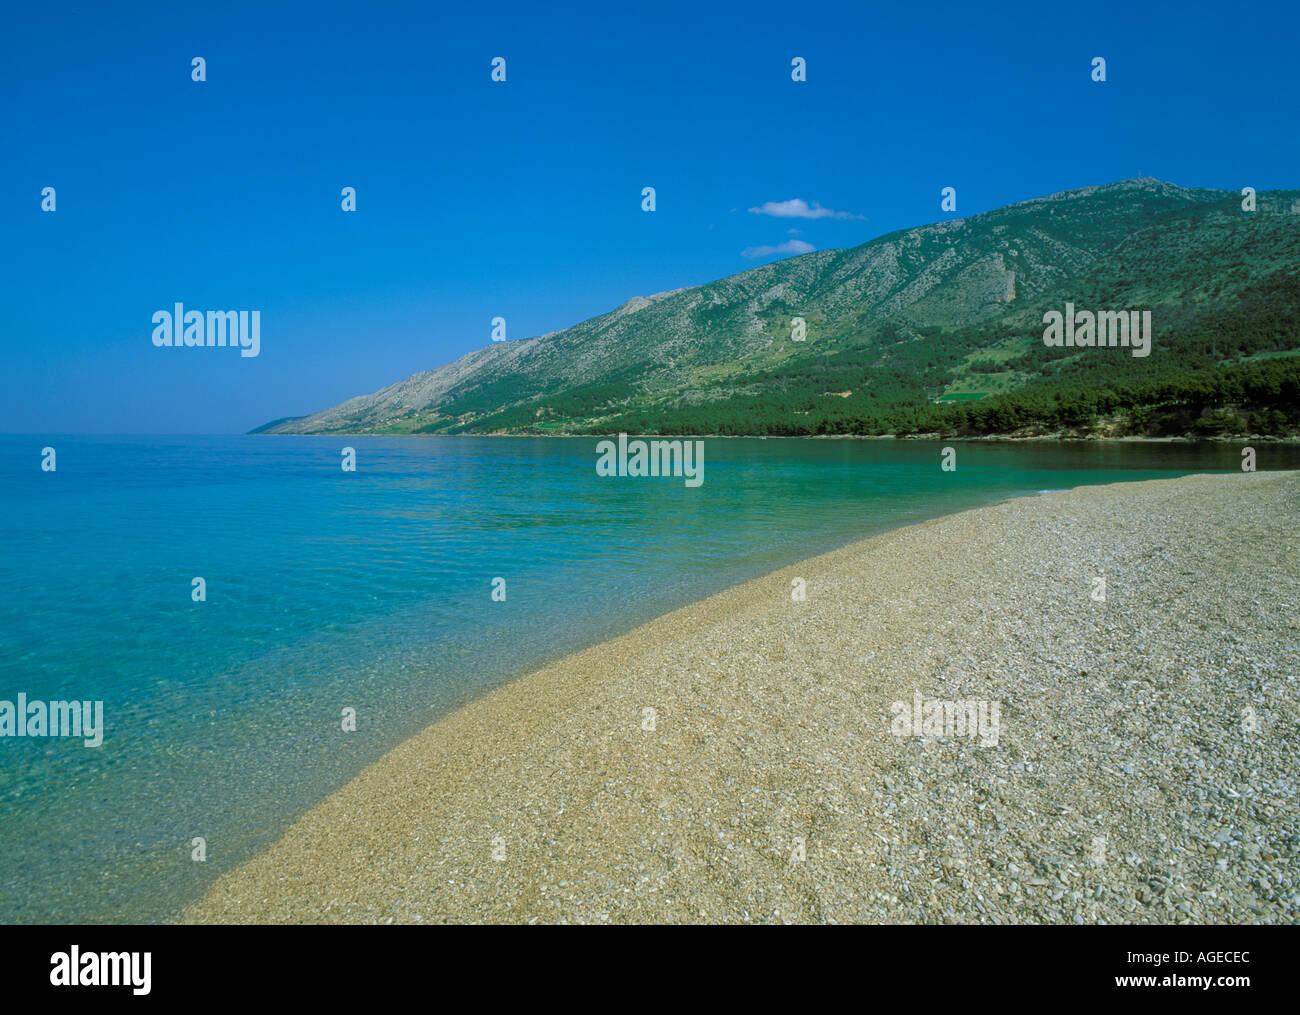 L'île de Brac Croatie Cape d'or Zlatni Rat Beach près de Bol Photo Stock